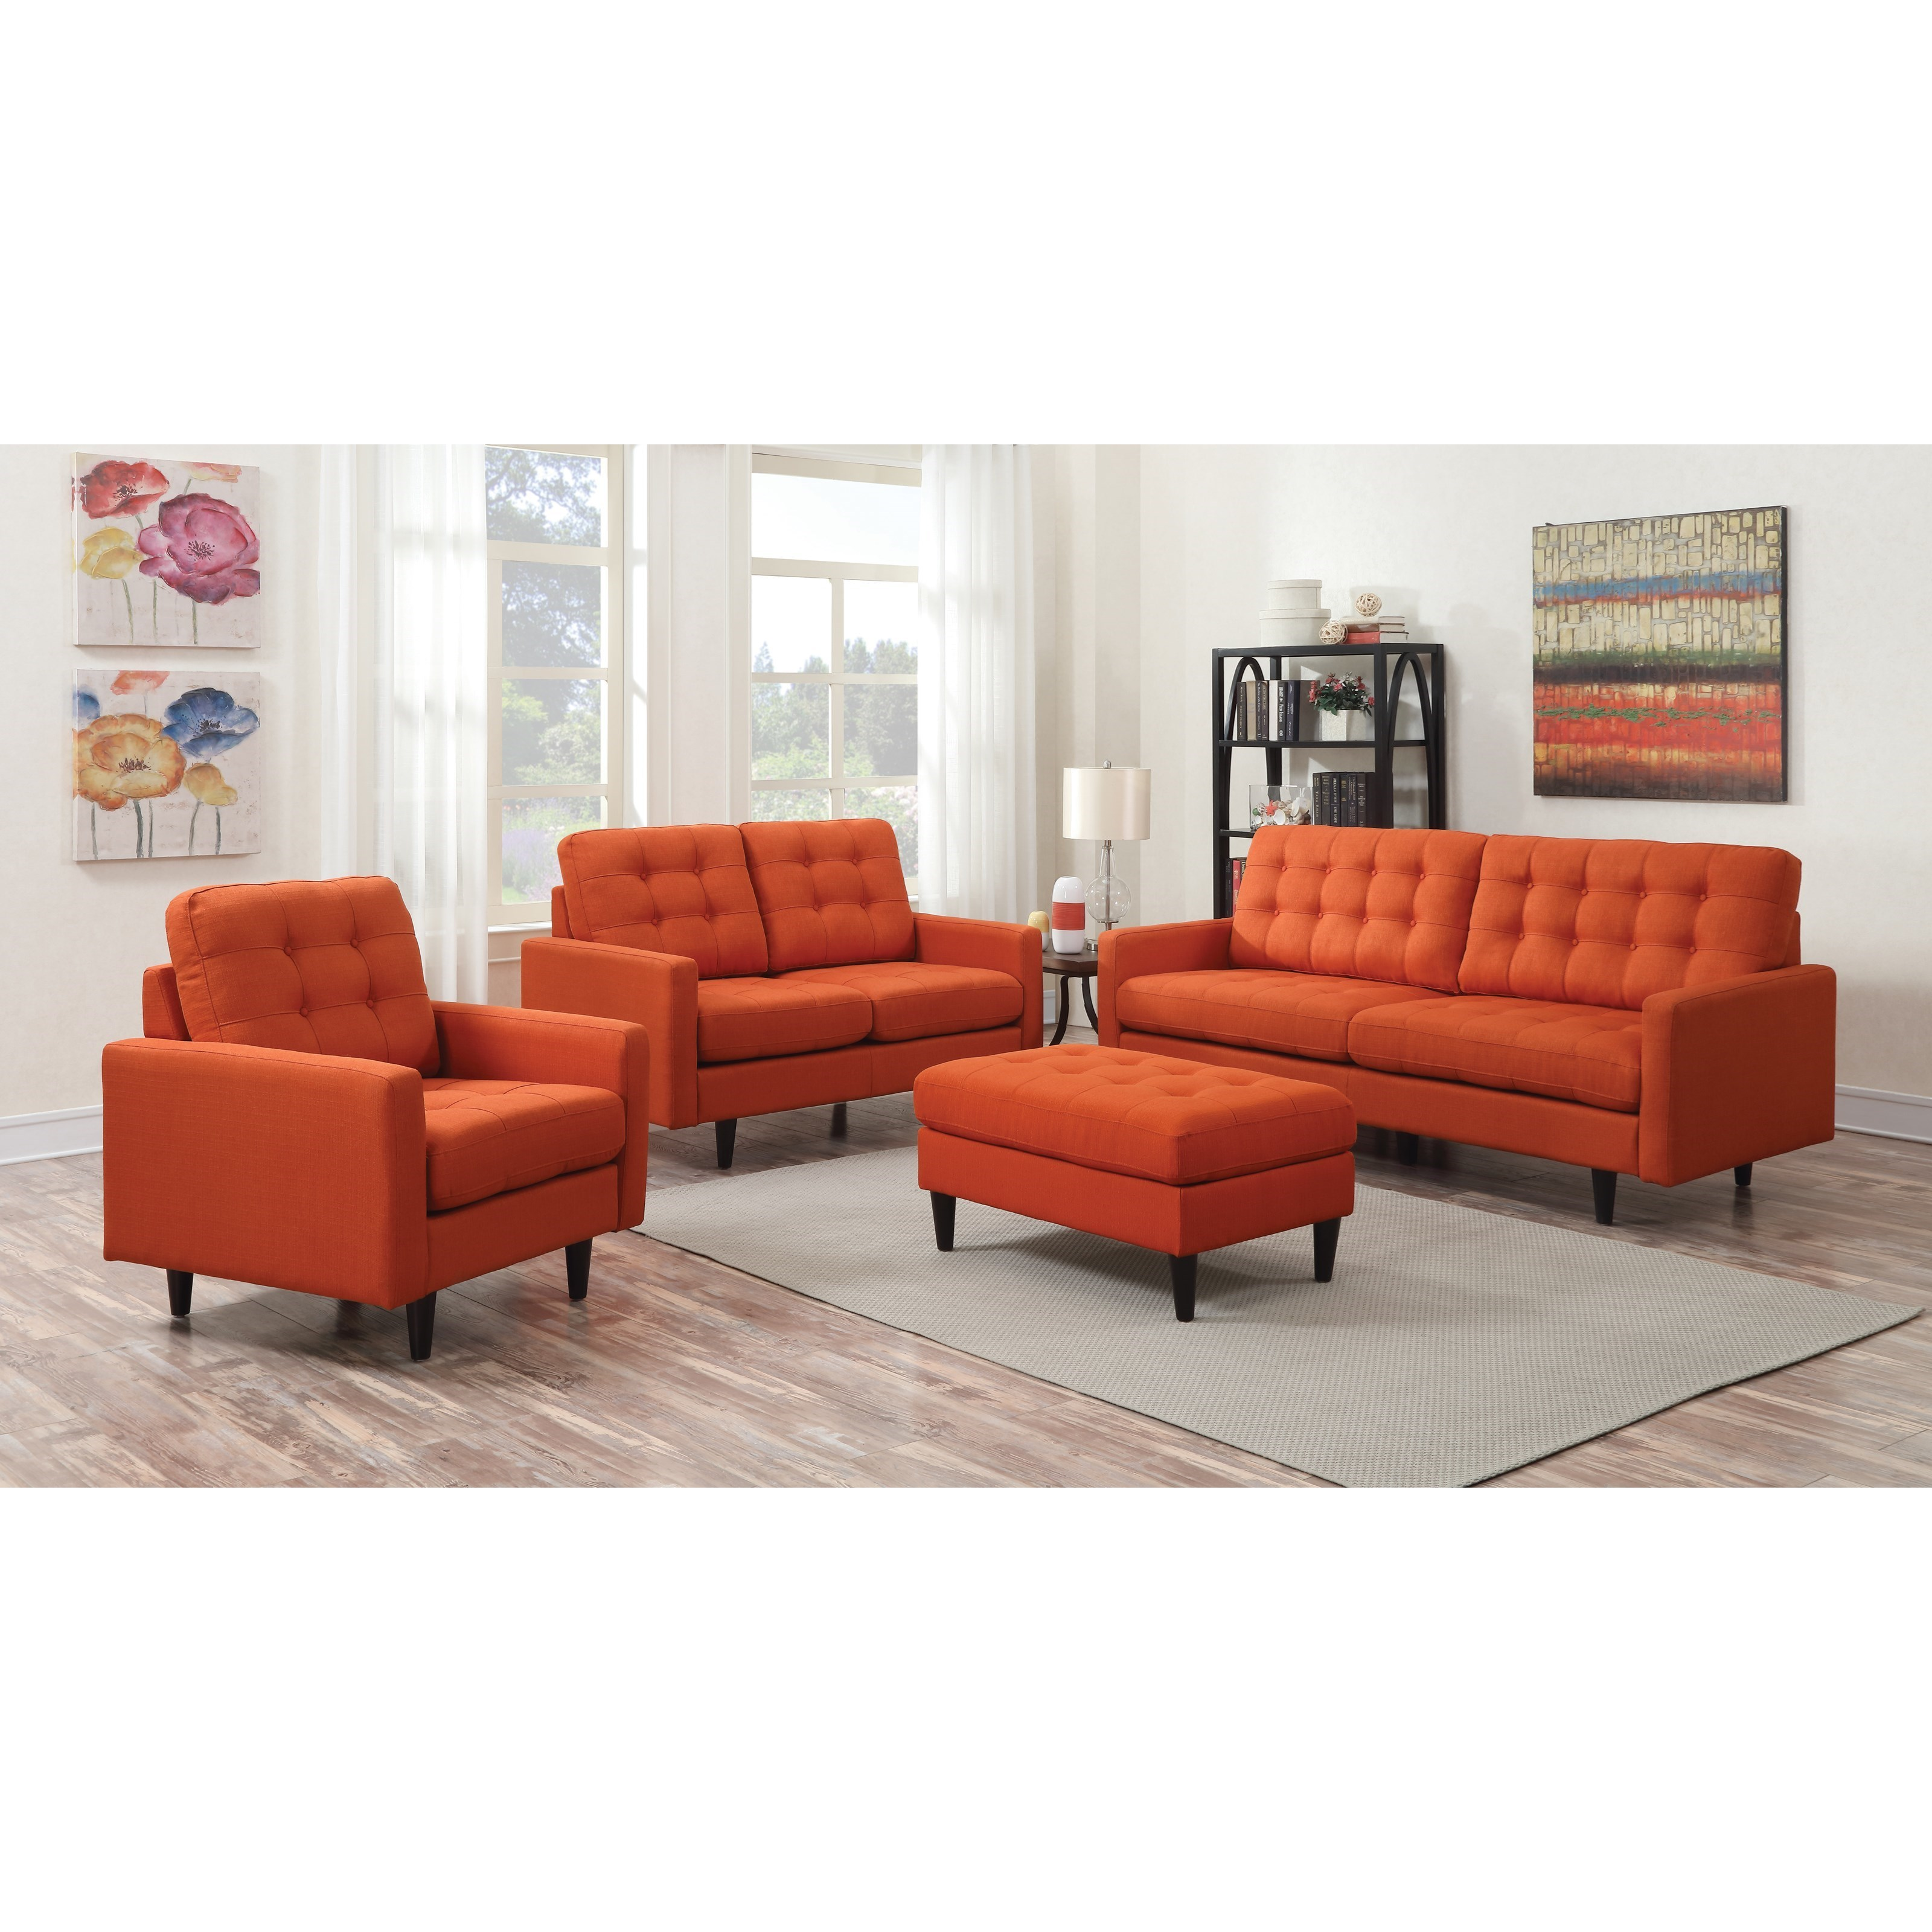 Coaster Kesson Stationary Living Room Group Del Sol Furniture Stationary Living Room Groups